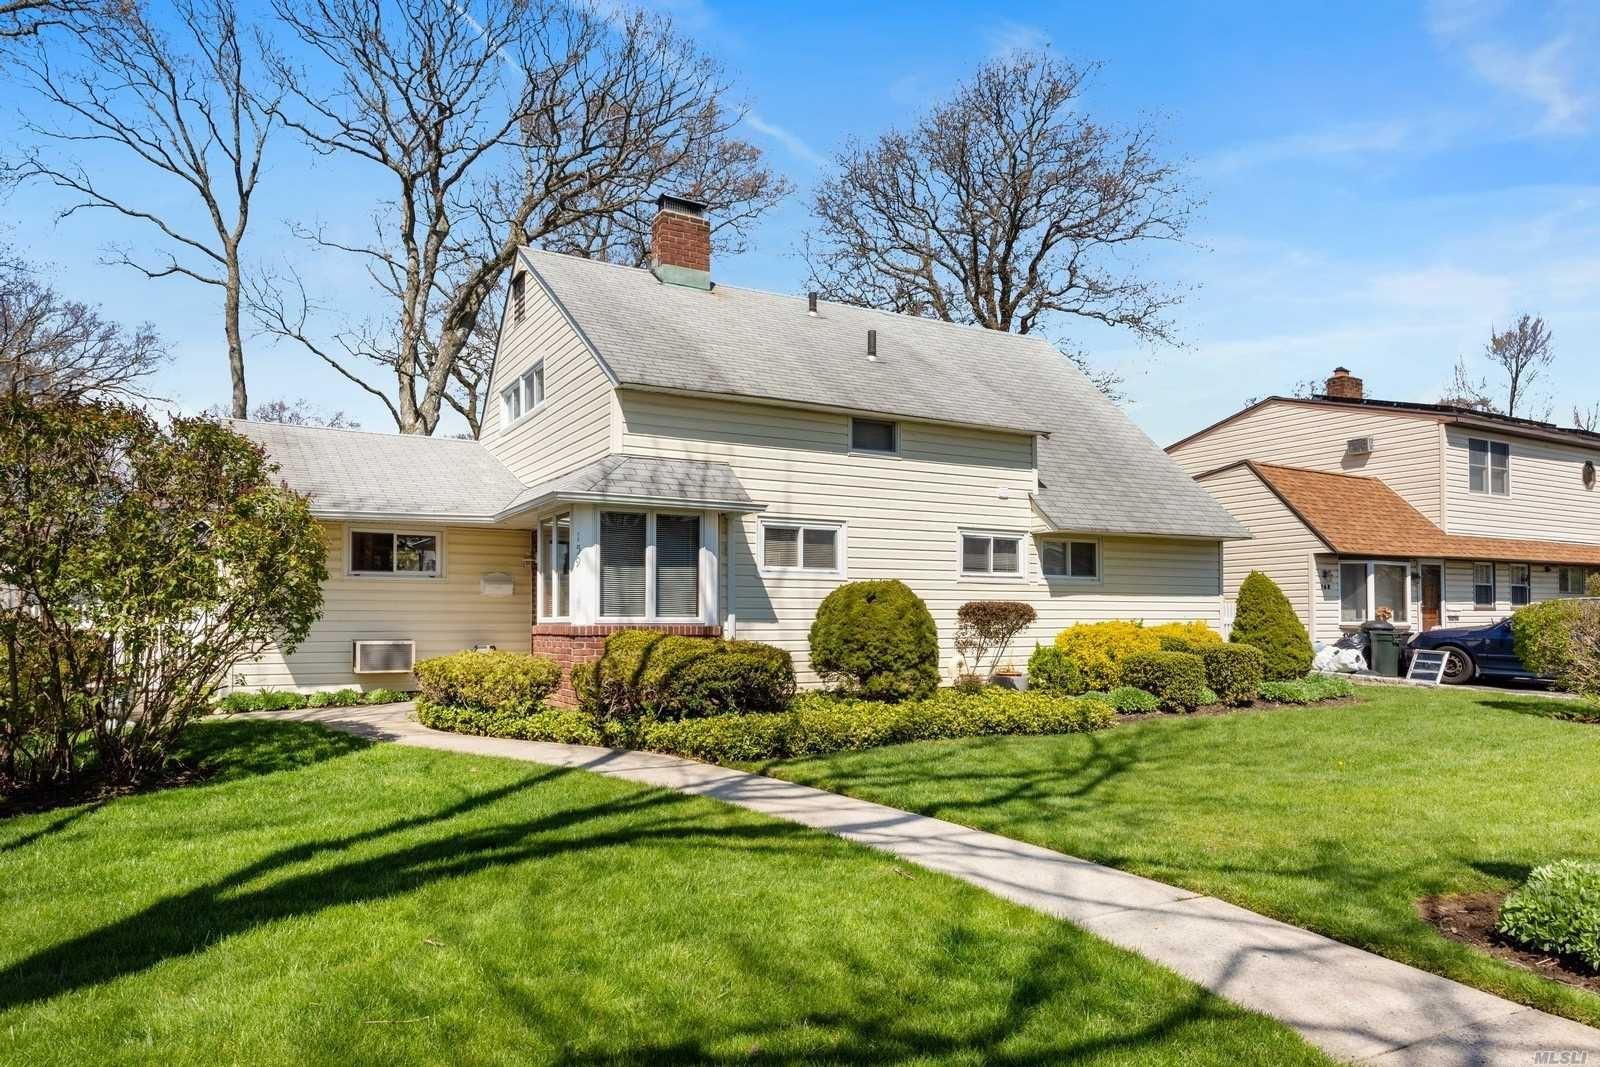 159 Twin Lane N, Wantagh, NY 11793 - MLS#: 3212089